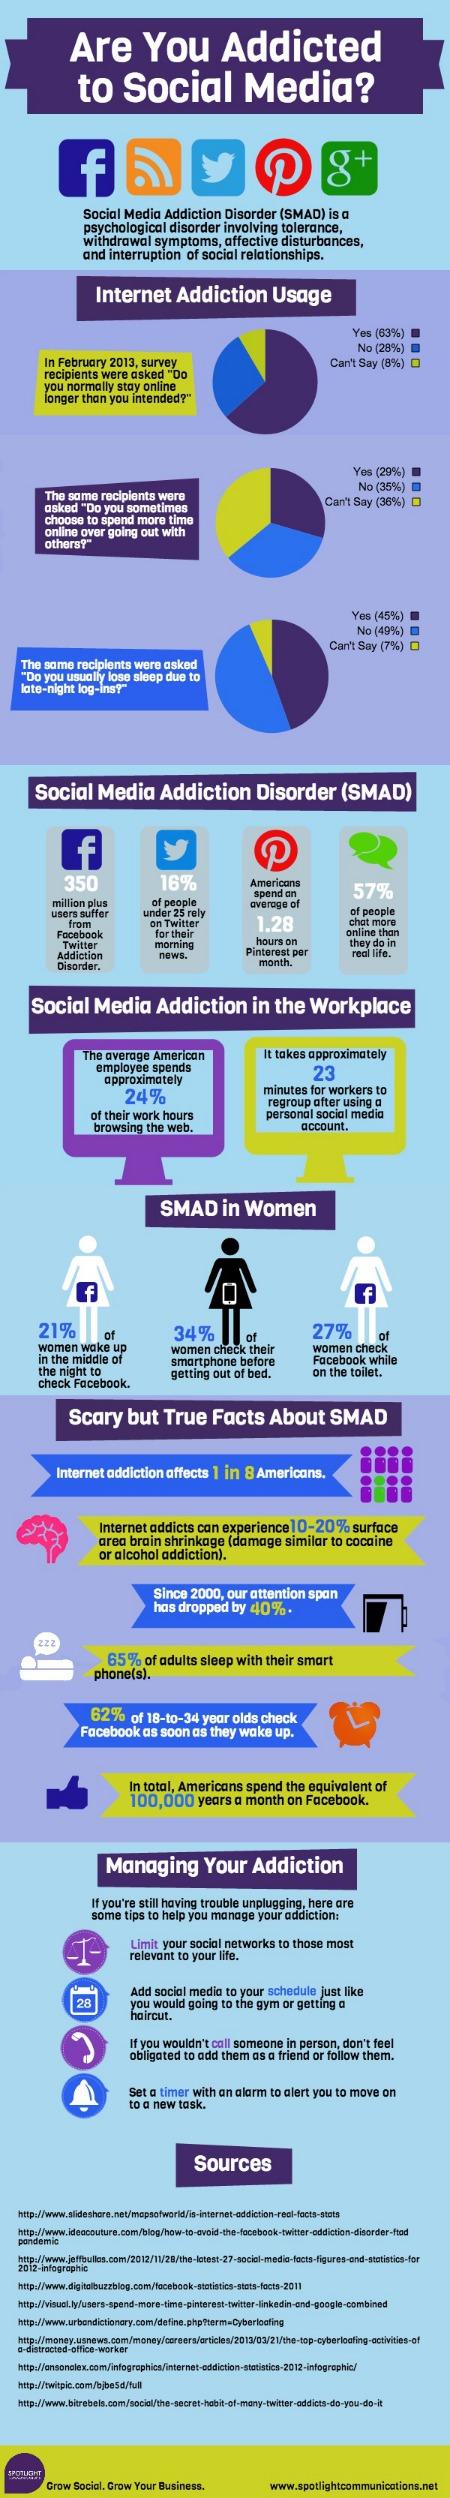 New-Social-Media-Addiction-Infographic